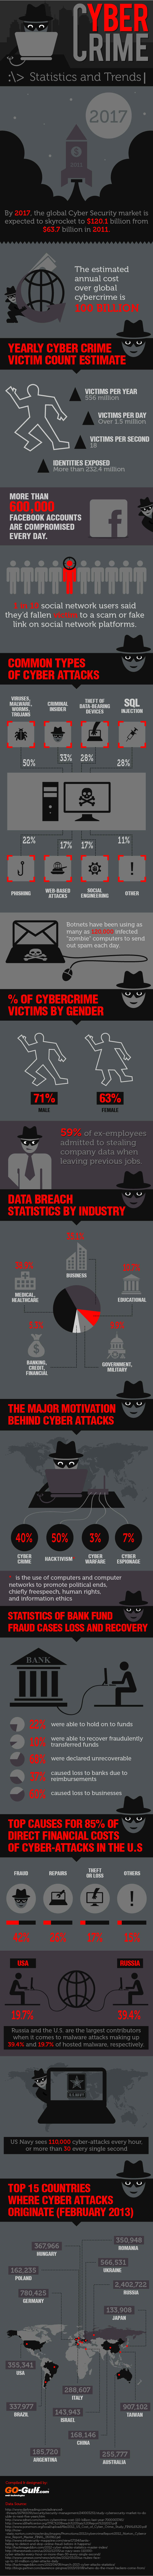 cyber-crime-statistics-trends